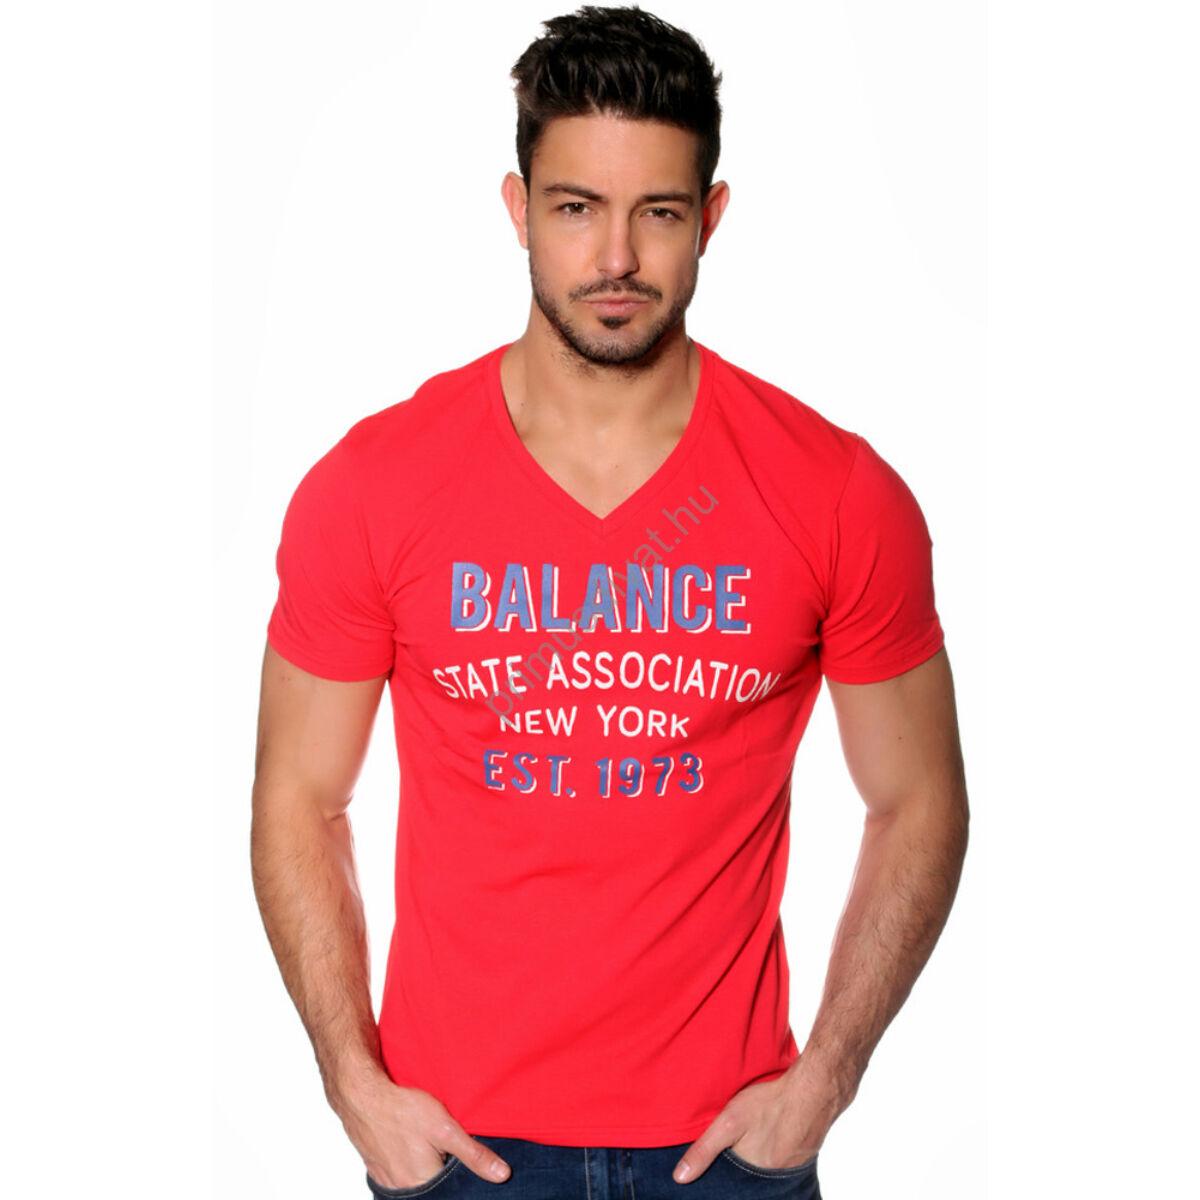 03362ae69b Kép 1/2 - Balance V nyakú, filmnyomott, rugalmas rövid ujjú póló, piros